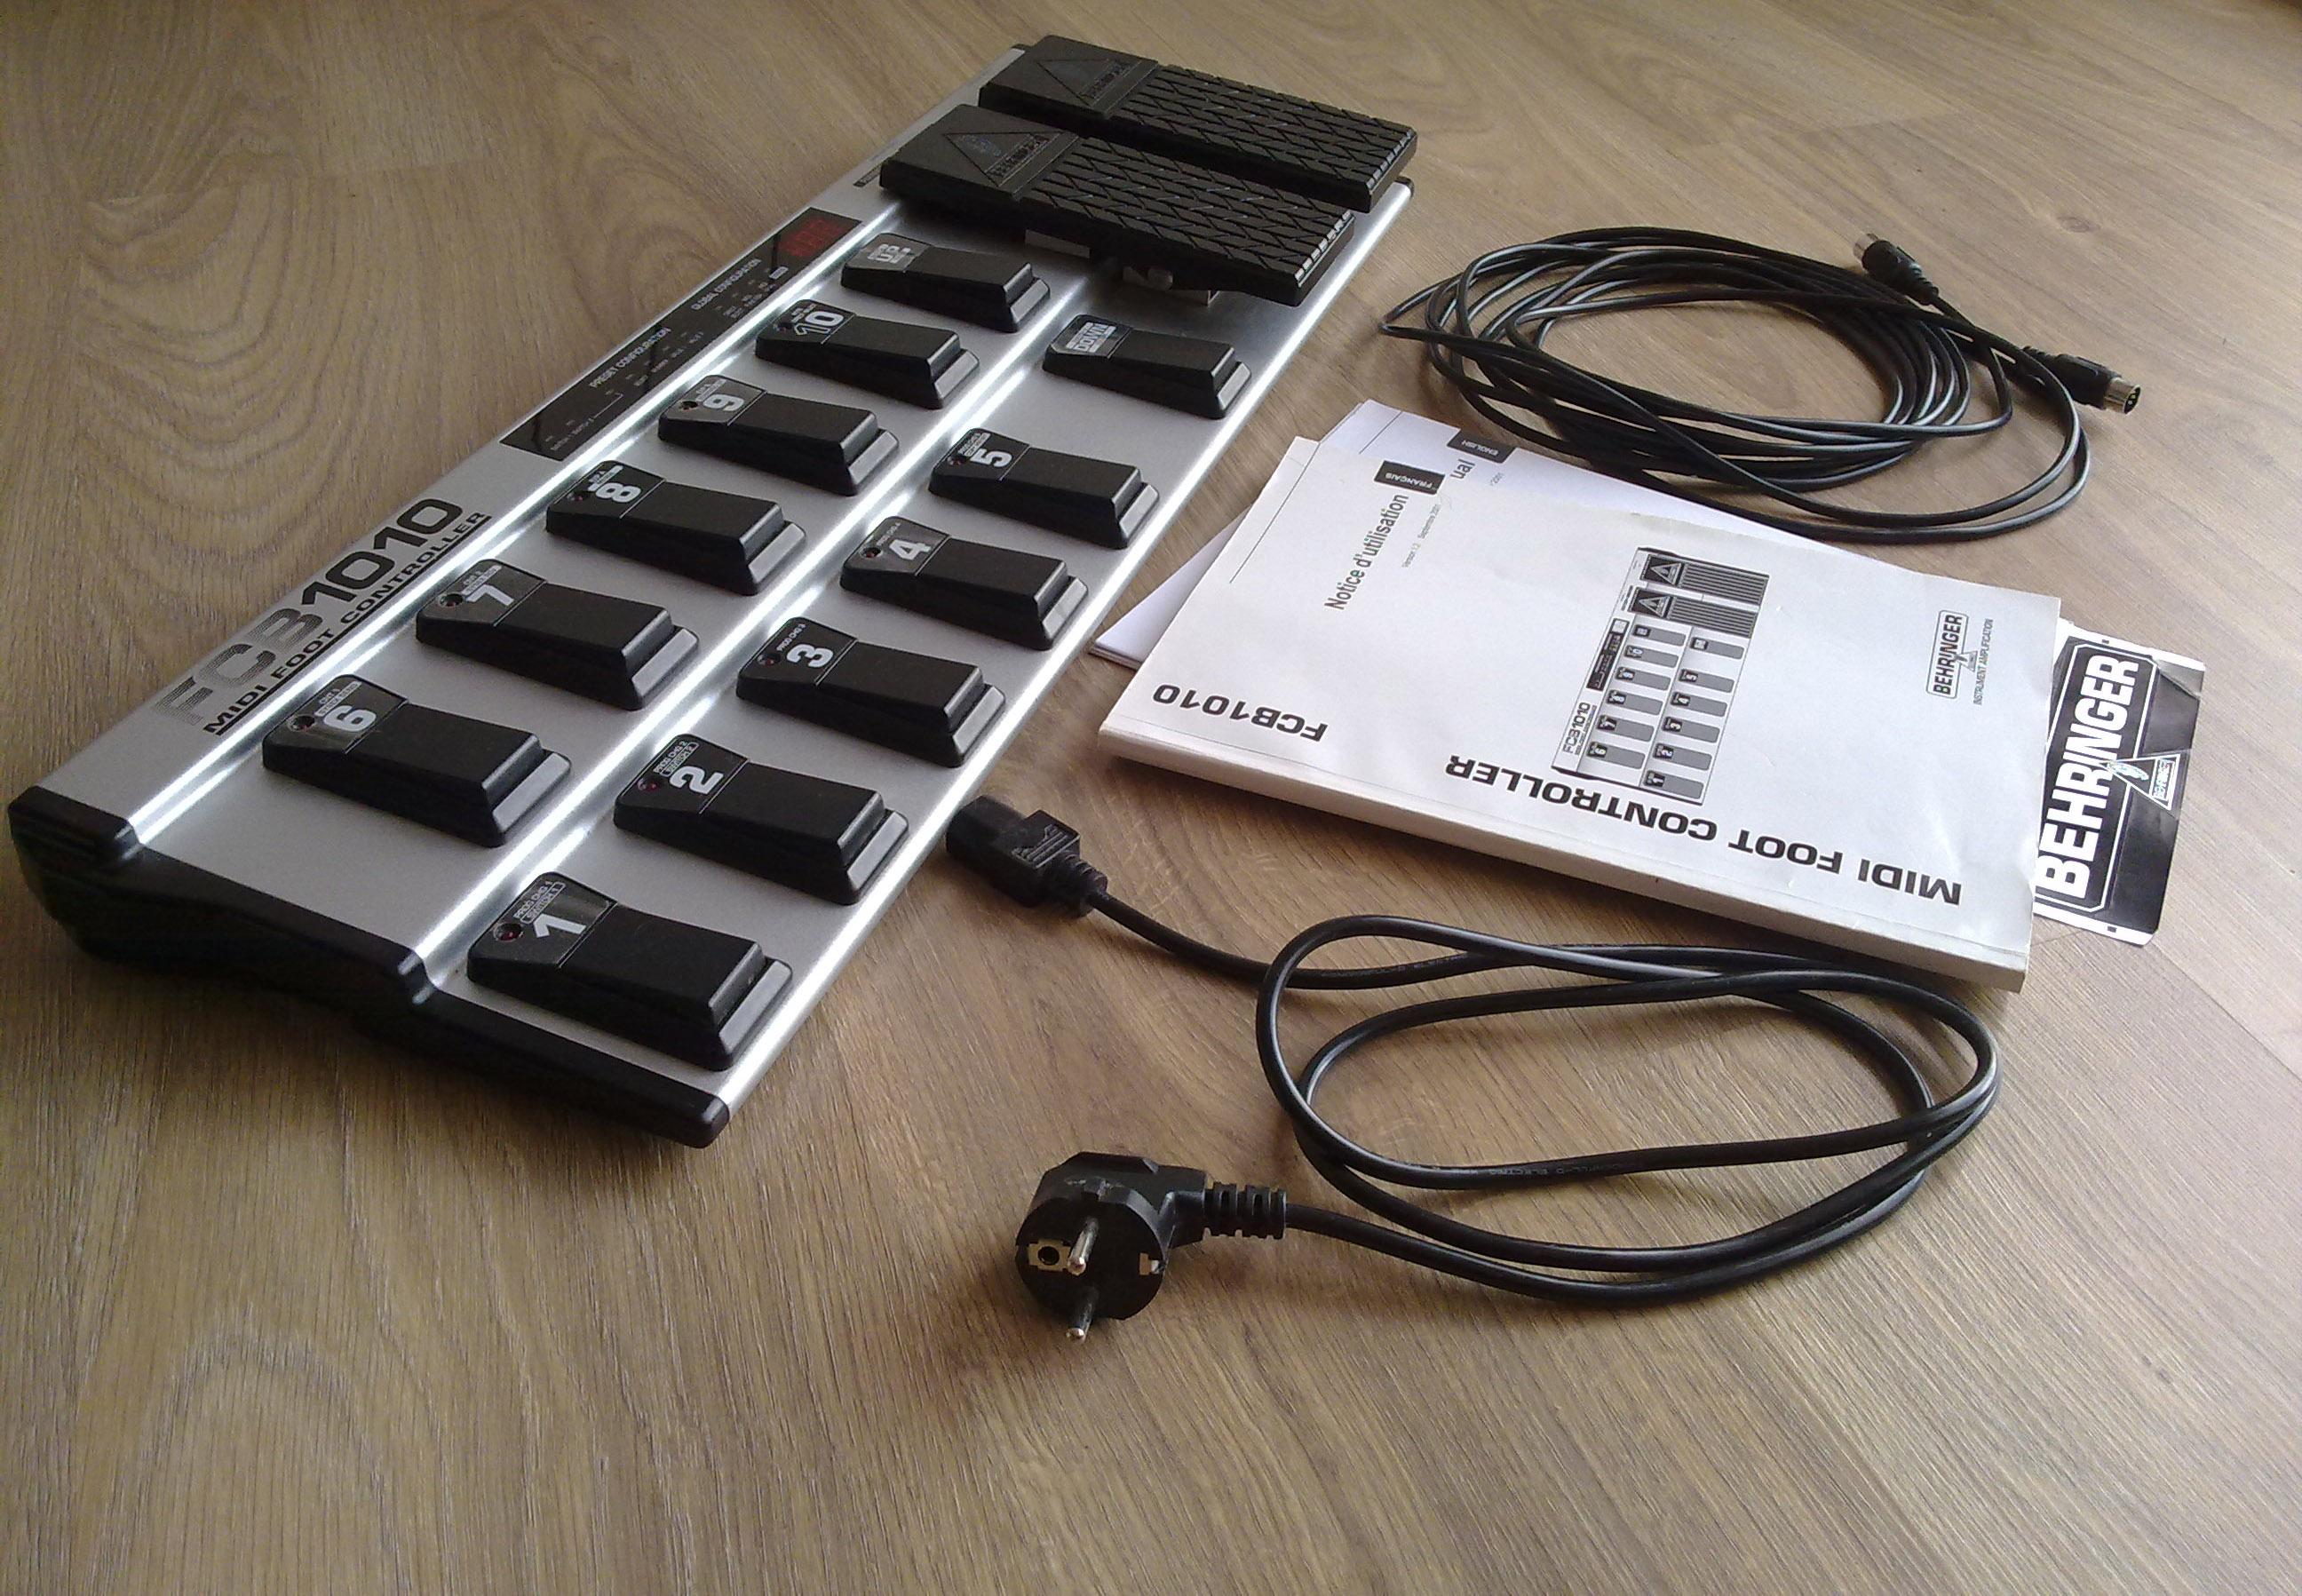 behringer-fcb1010-midi-foot-controller-380166.jpg